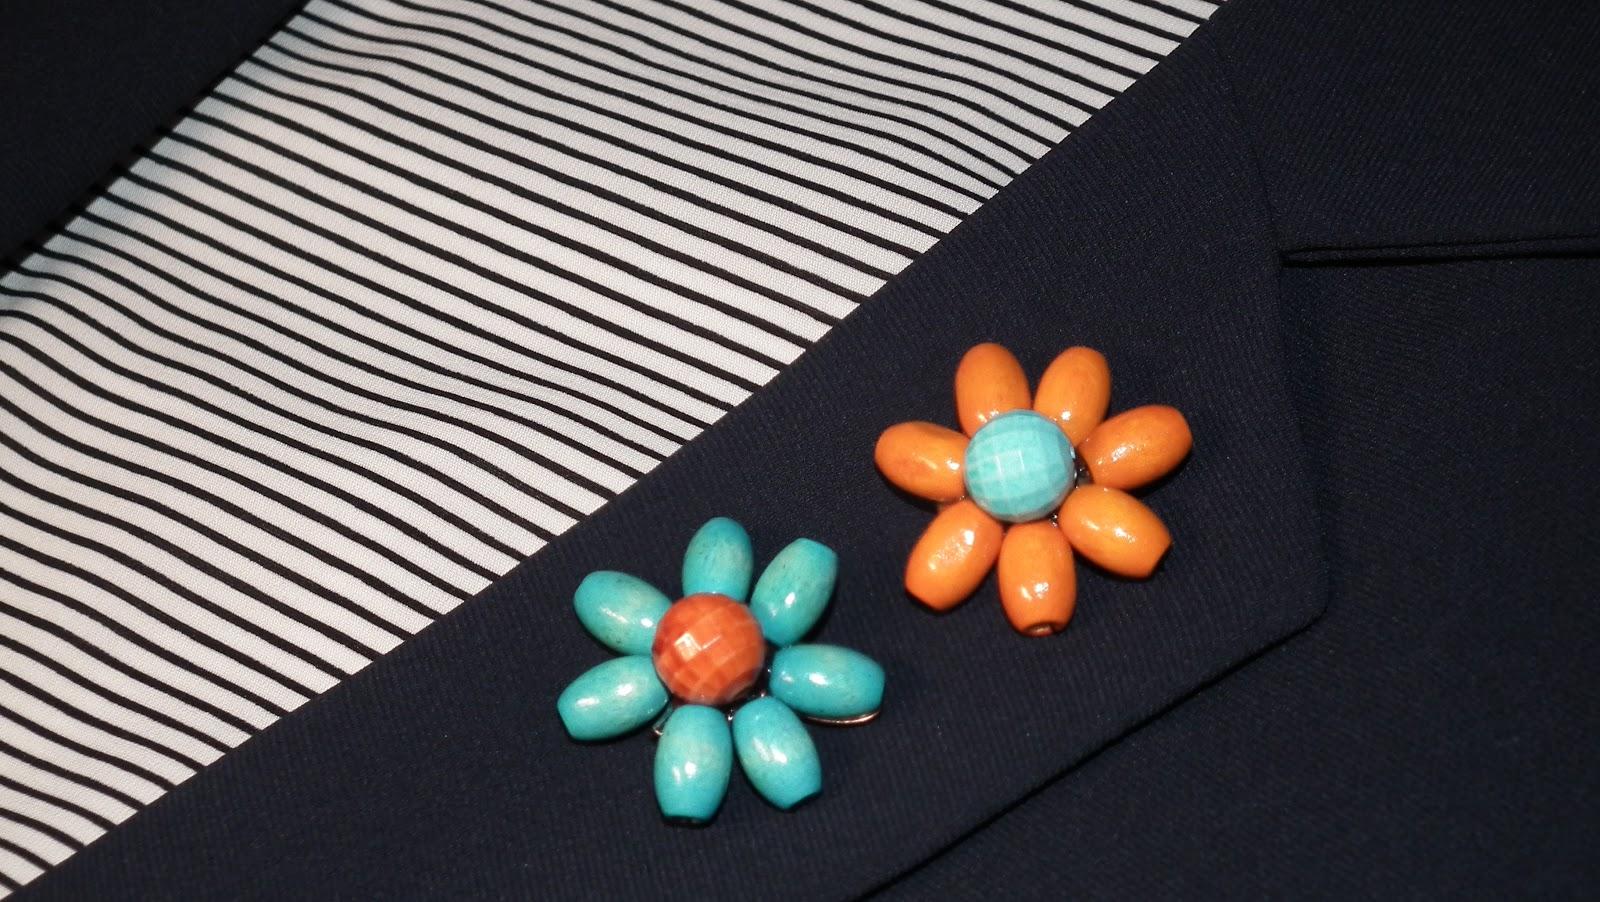 broche marusa flor colores bonito original barato € regalo reyes madre novia detalles boda